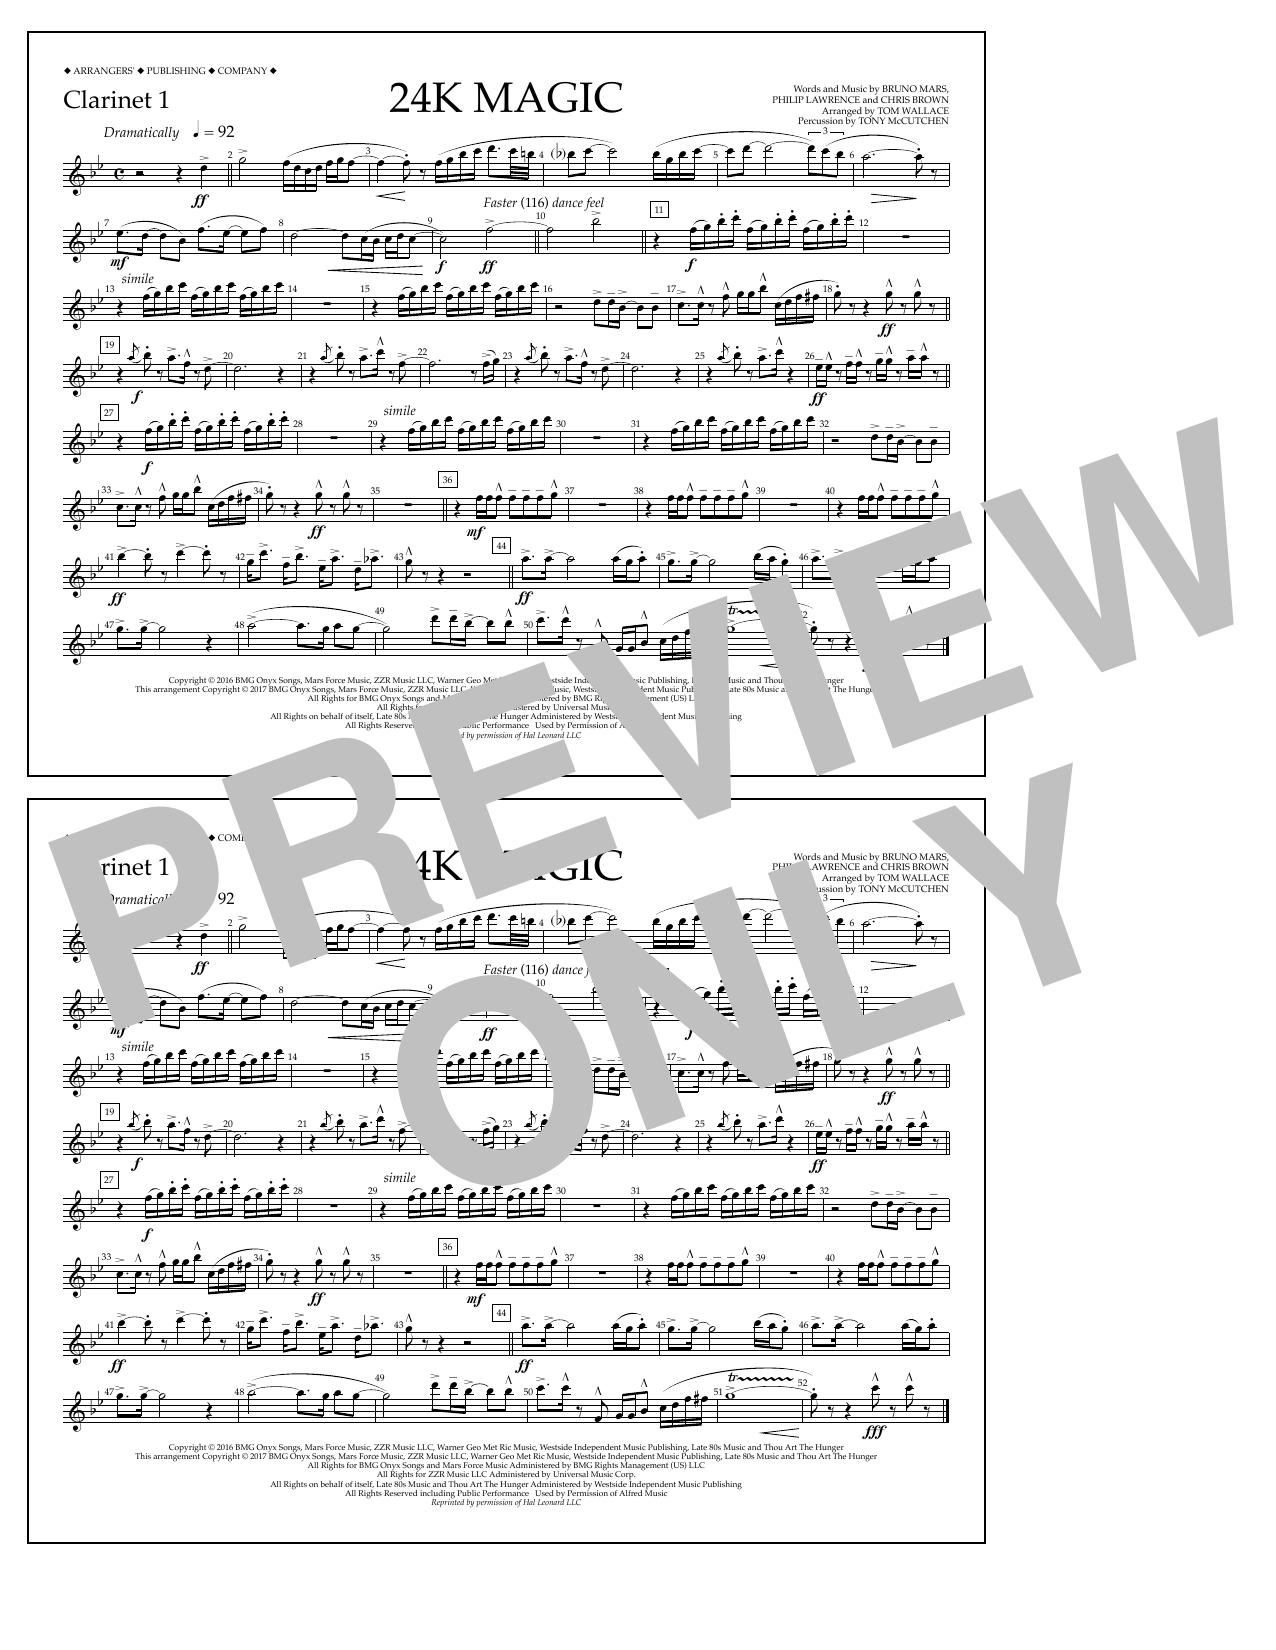 24K Magic - Clarinet 1 Sheet Music